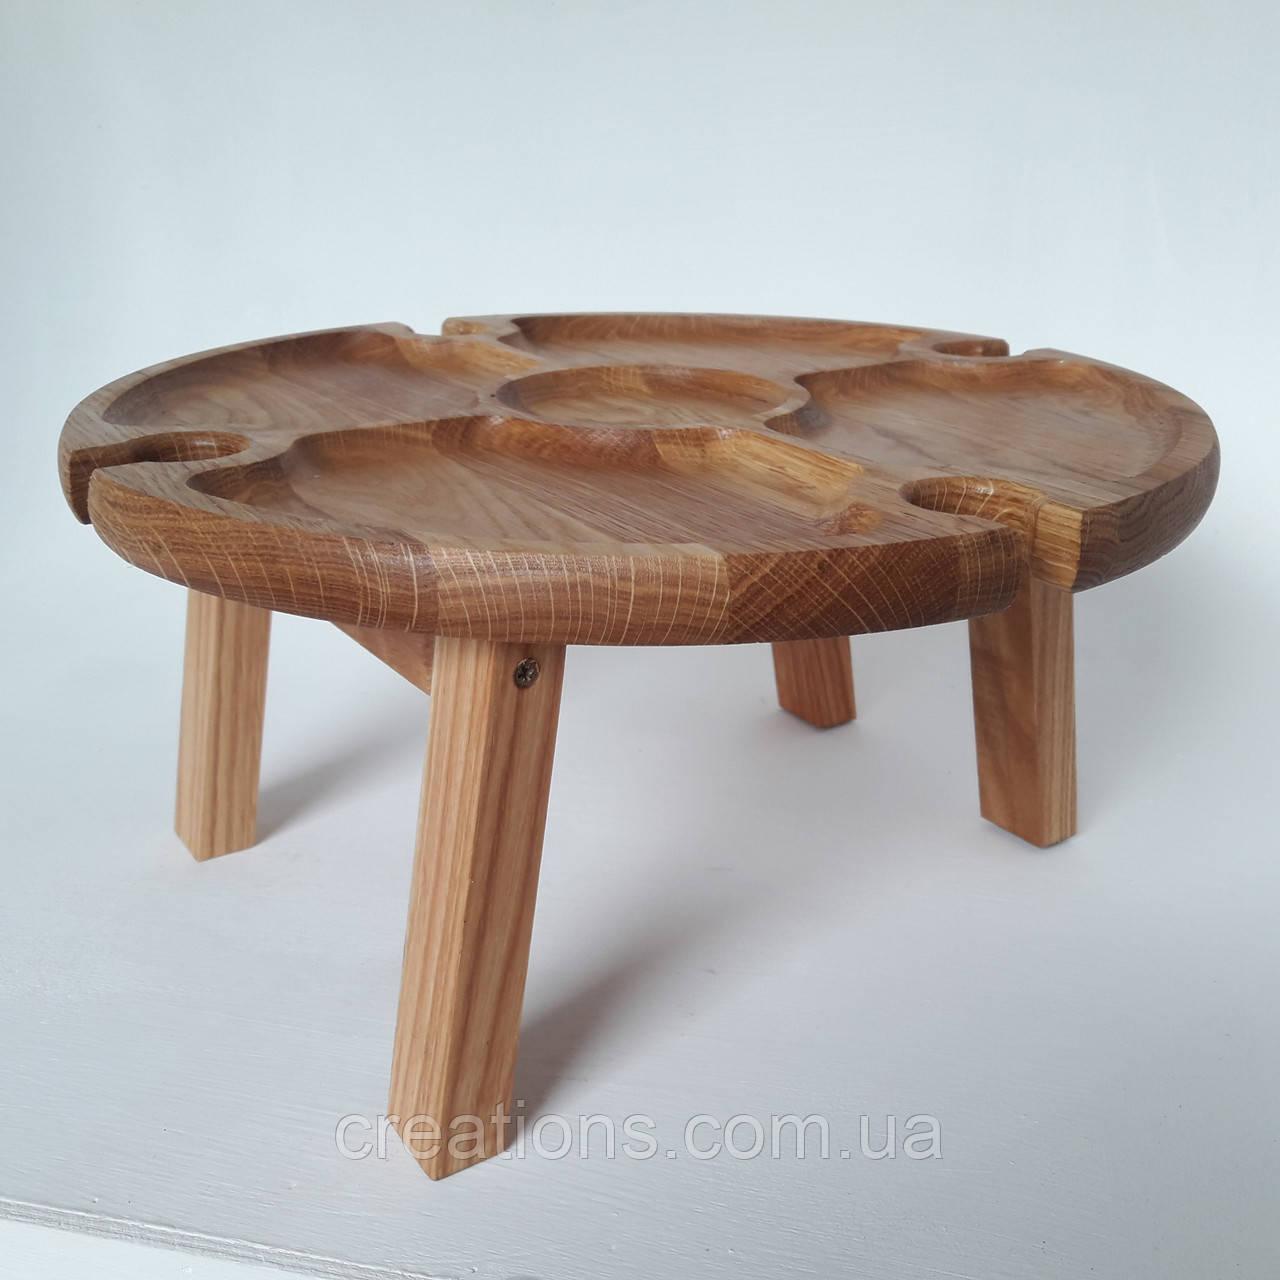 Столик для вина из дуба - менажница на ножках из дерева 35х35х18 см. НМ-144